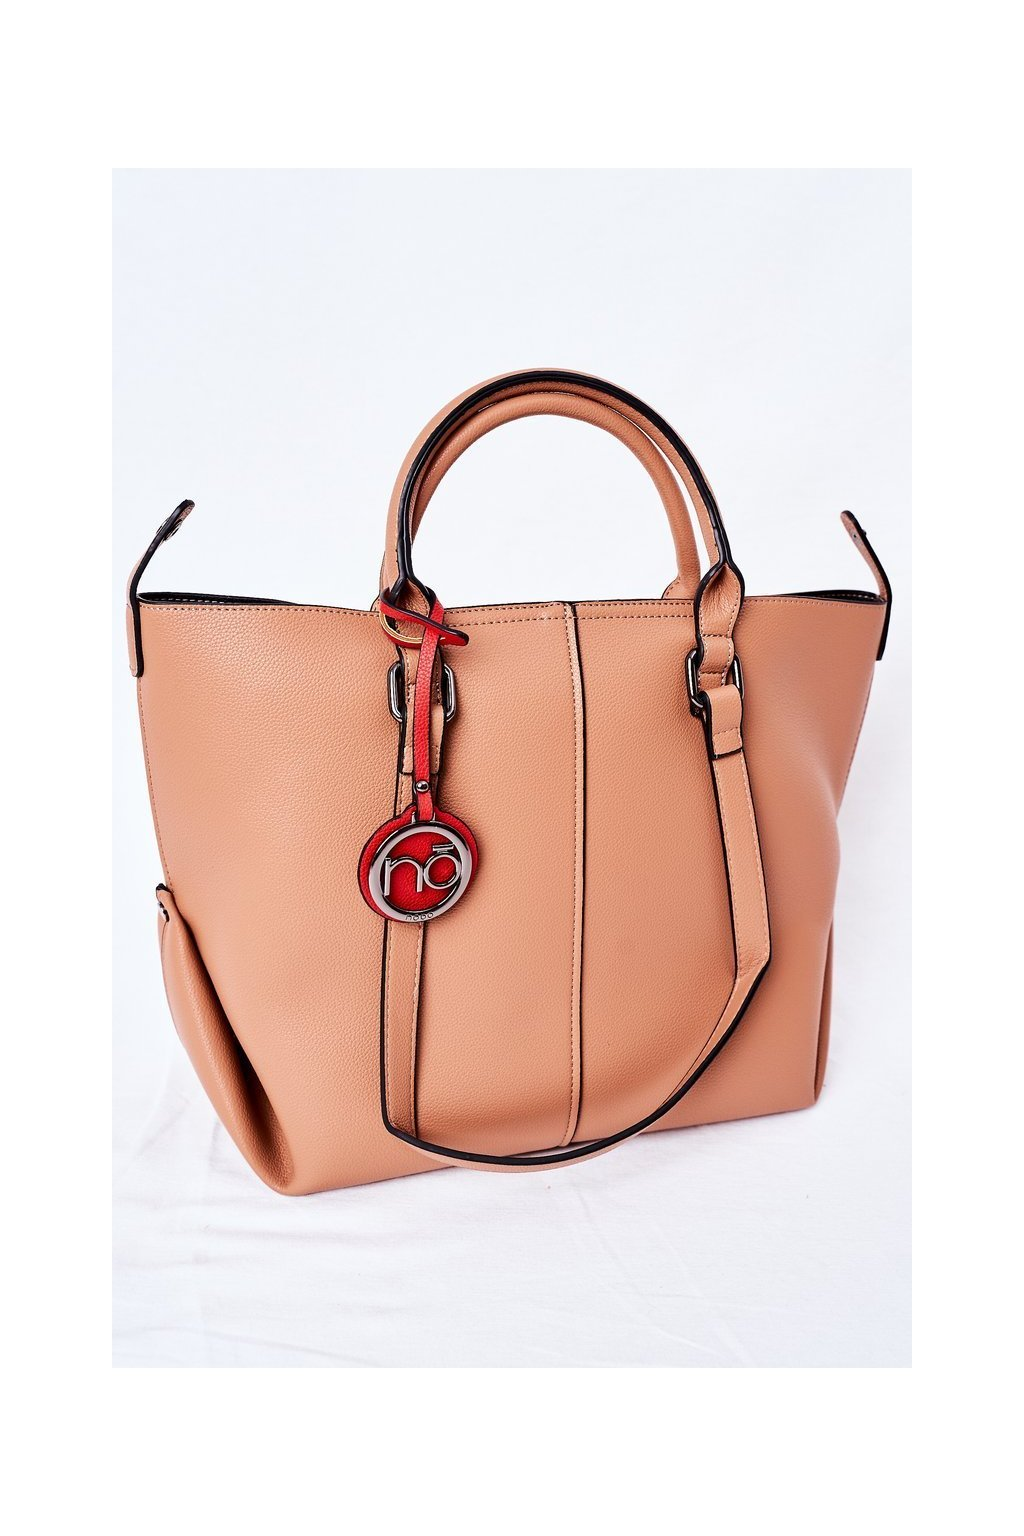 Dámska kabelka hnedá kód kabelky NBAG-K2300-C015 BROWN